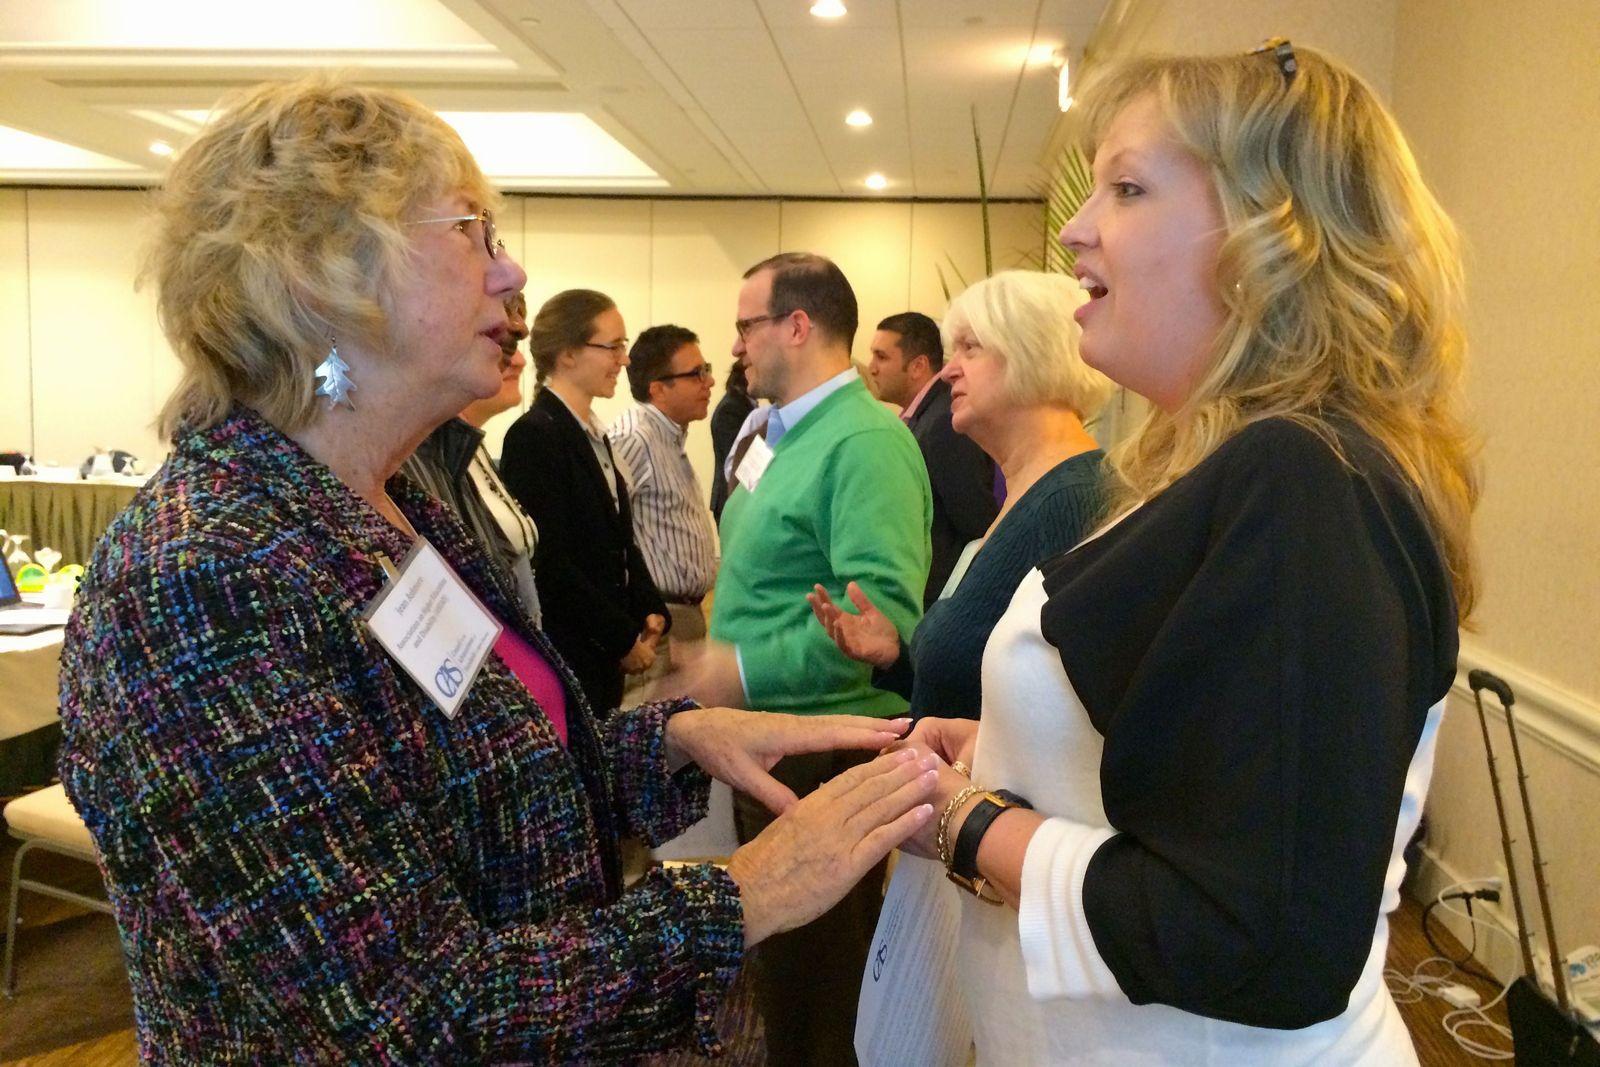 CAS Board members interact at the November 2014 meeting.